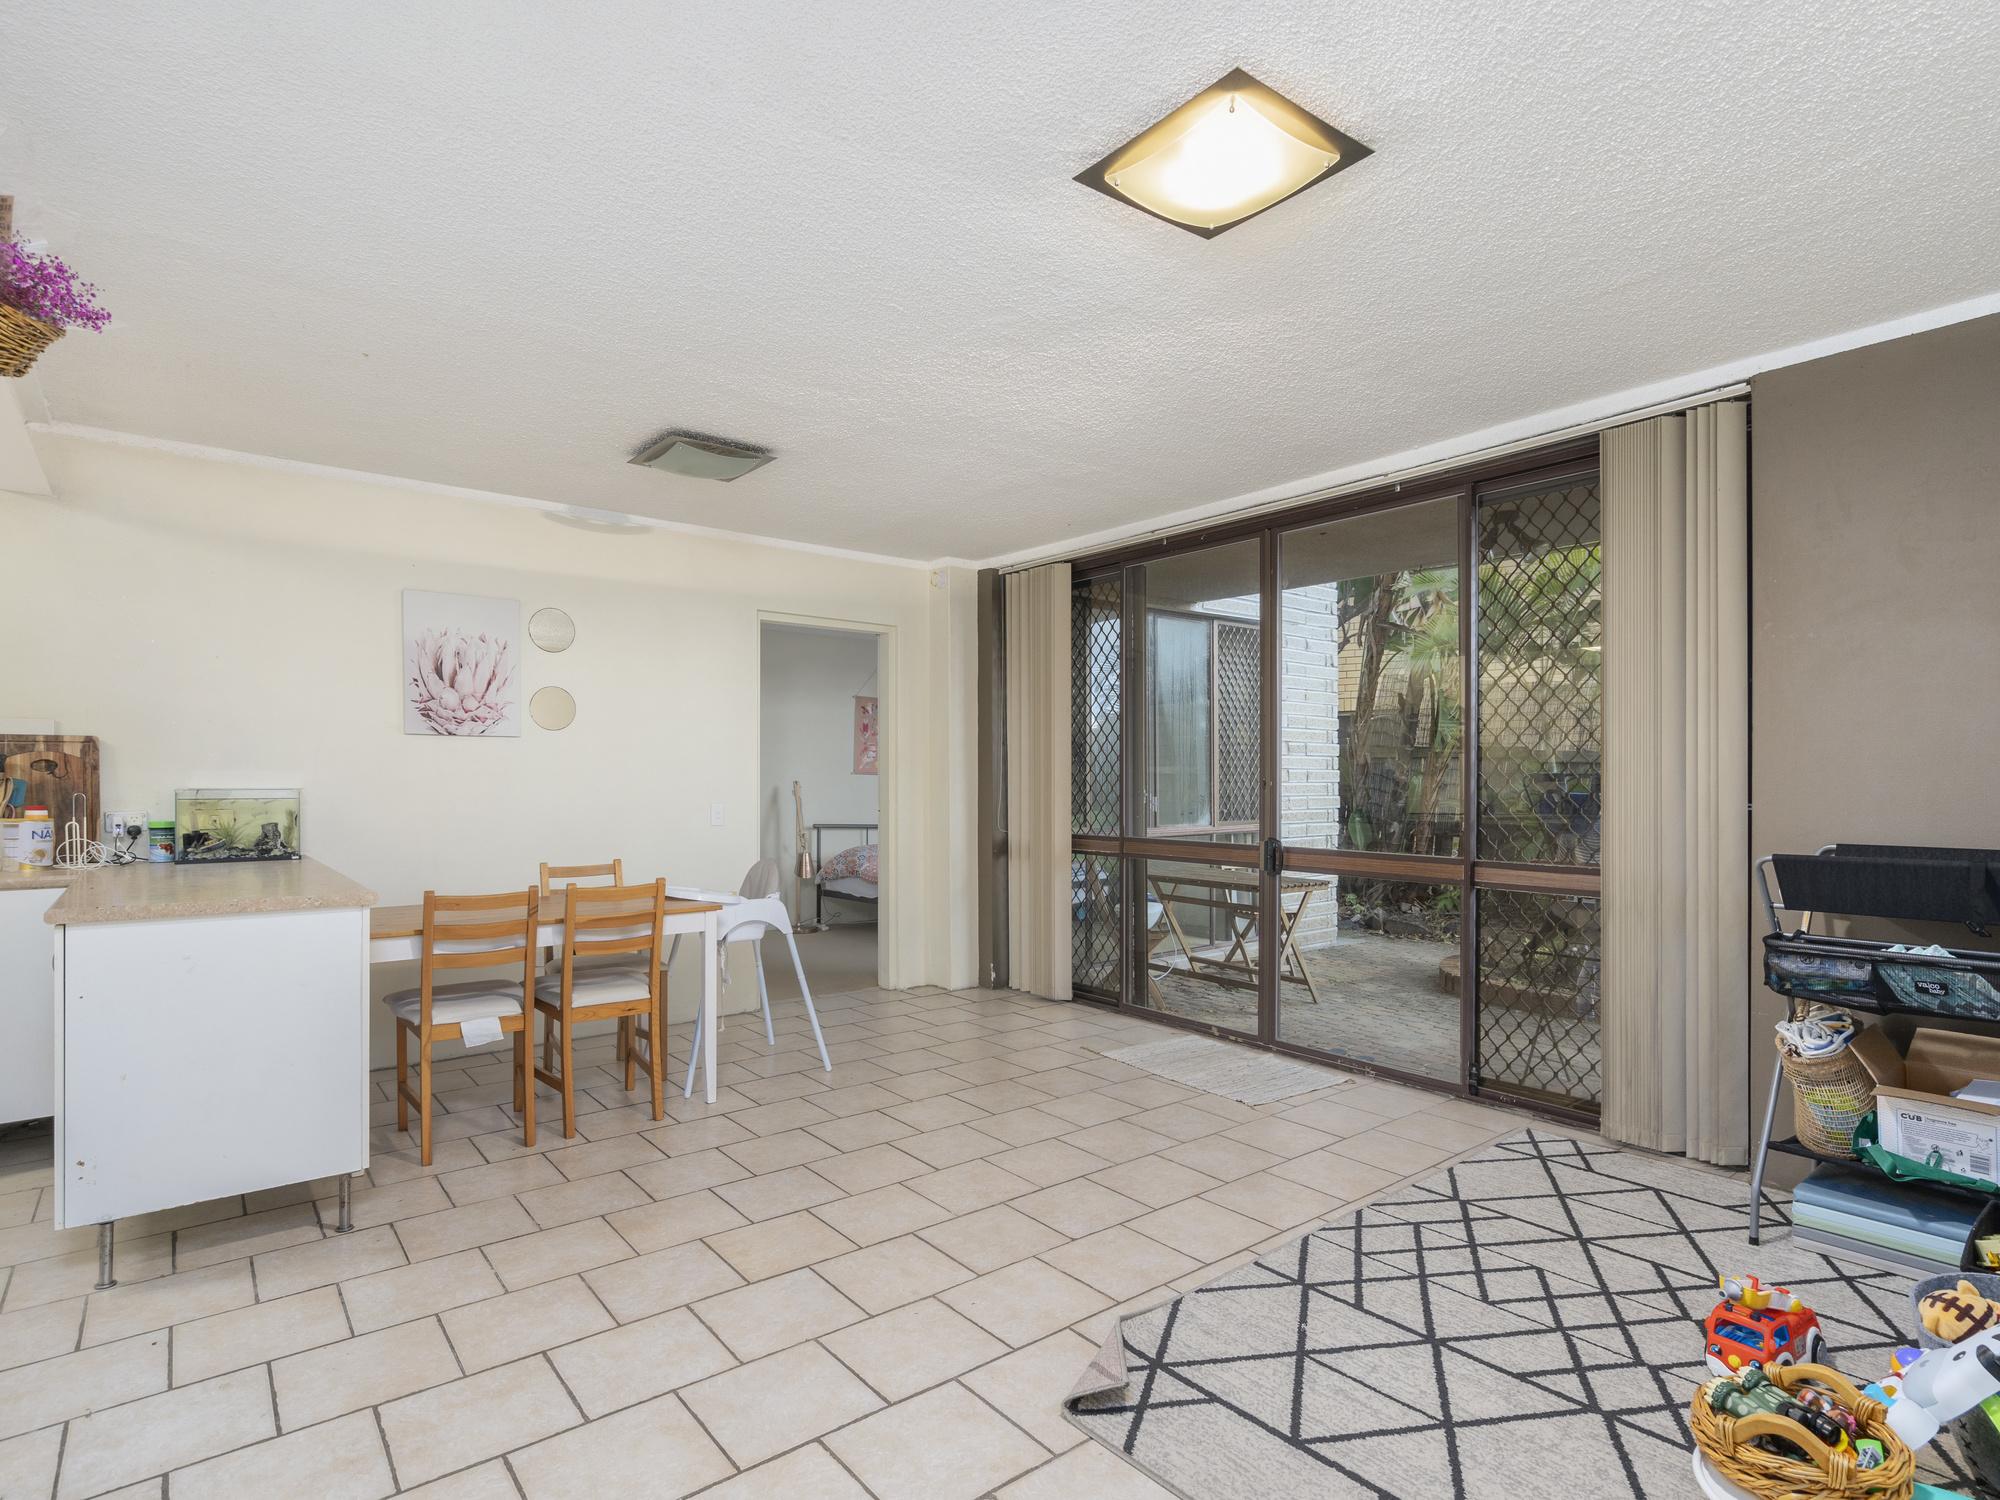 Real Estate | Gold Coast | Chevron Realty | 003 Open2view Id698602 2 33 Darrambal Street